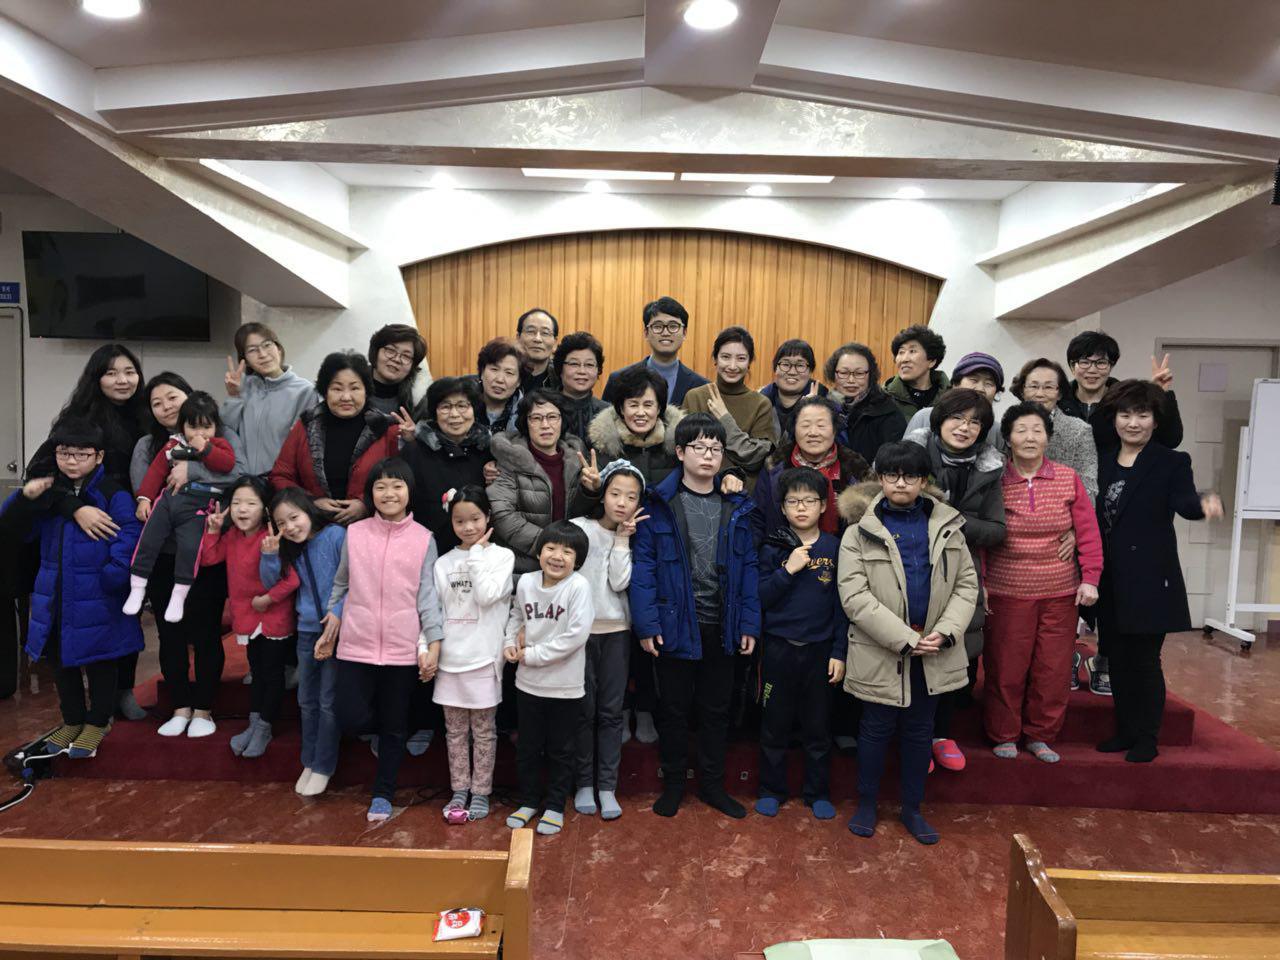 photo_2018-02-13_17-05-54.jpg